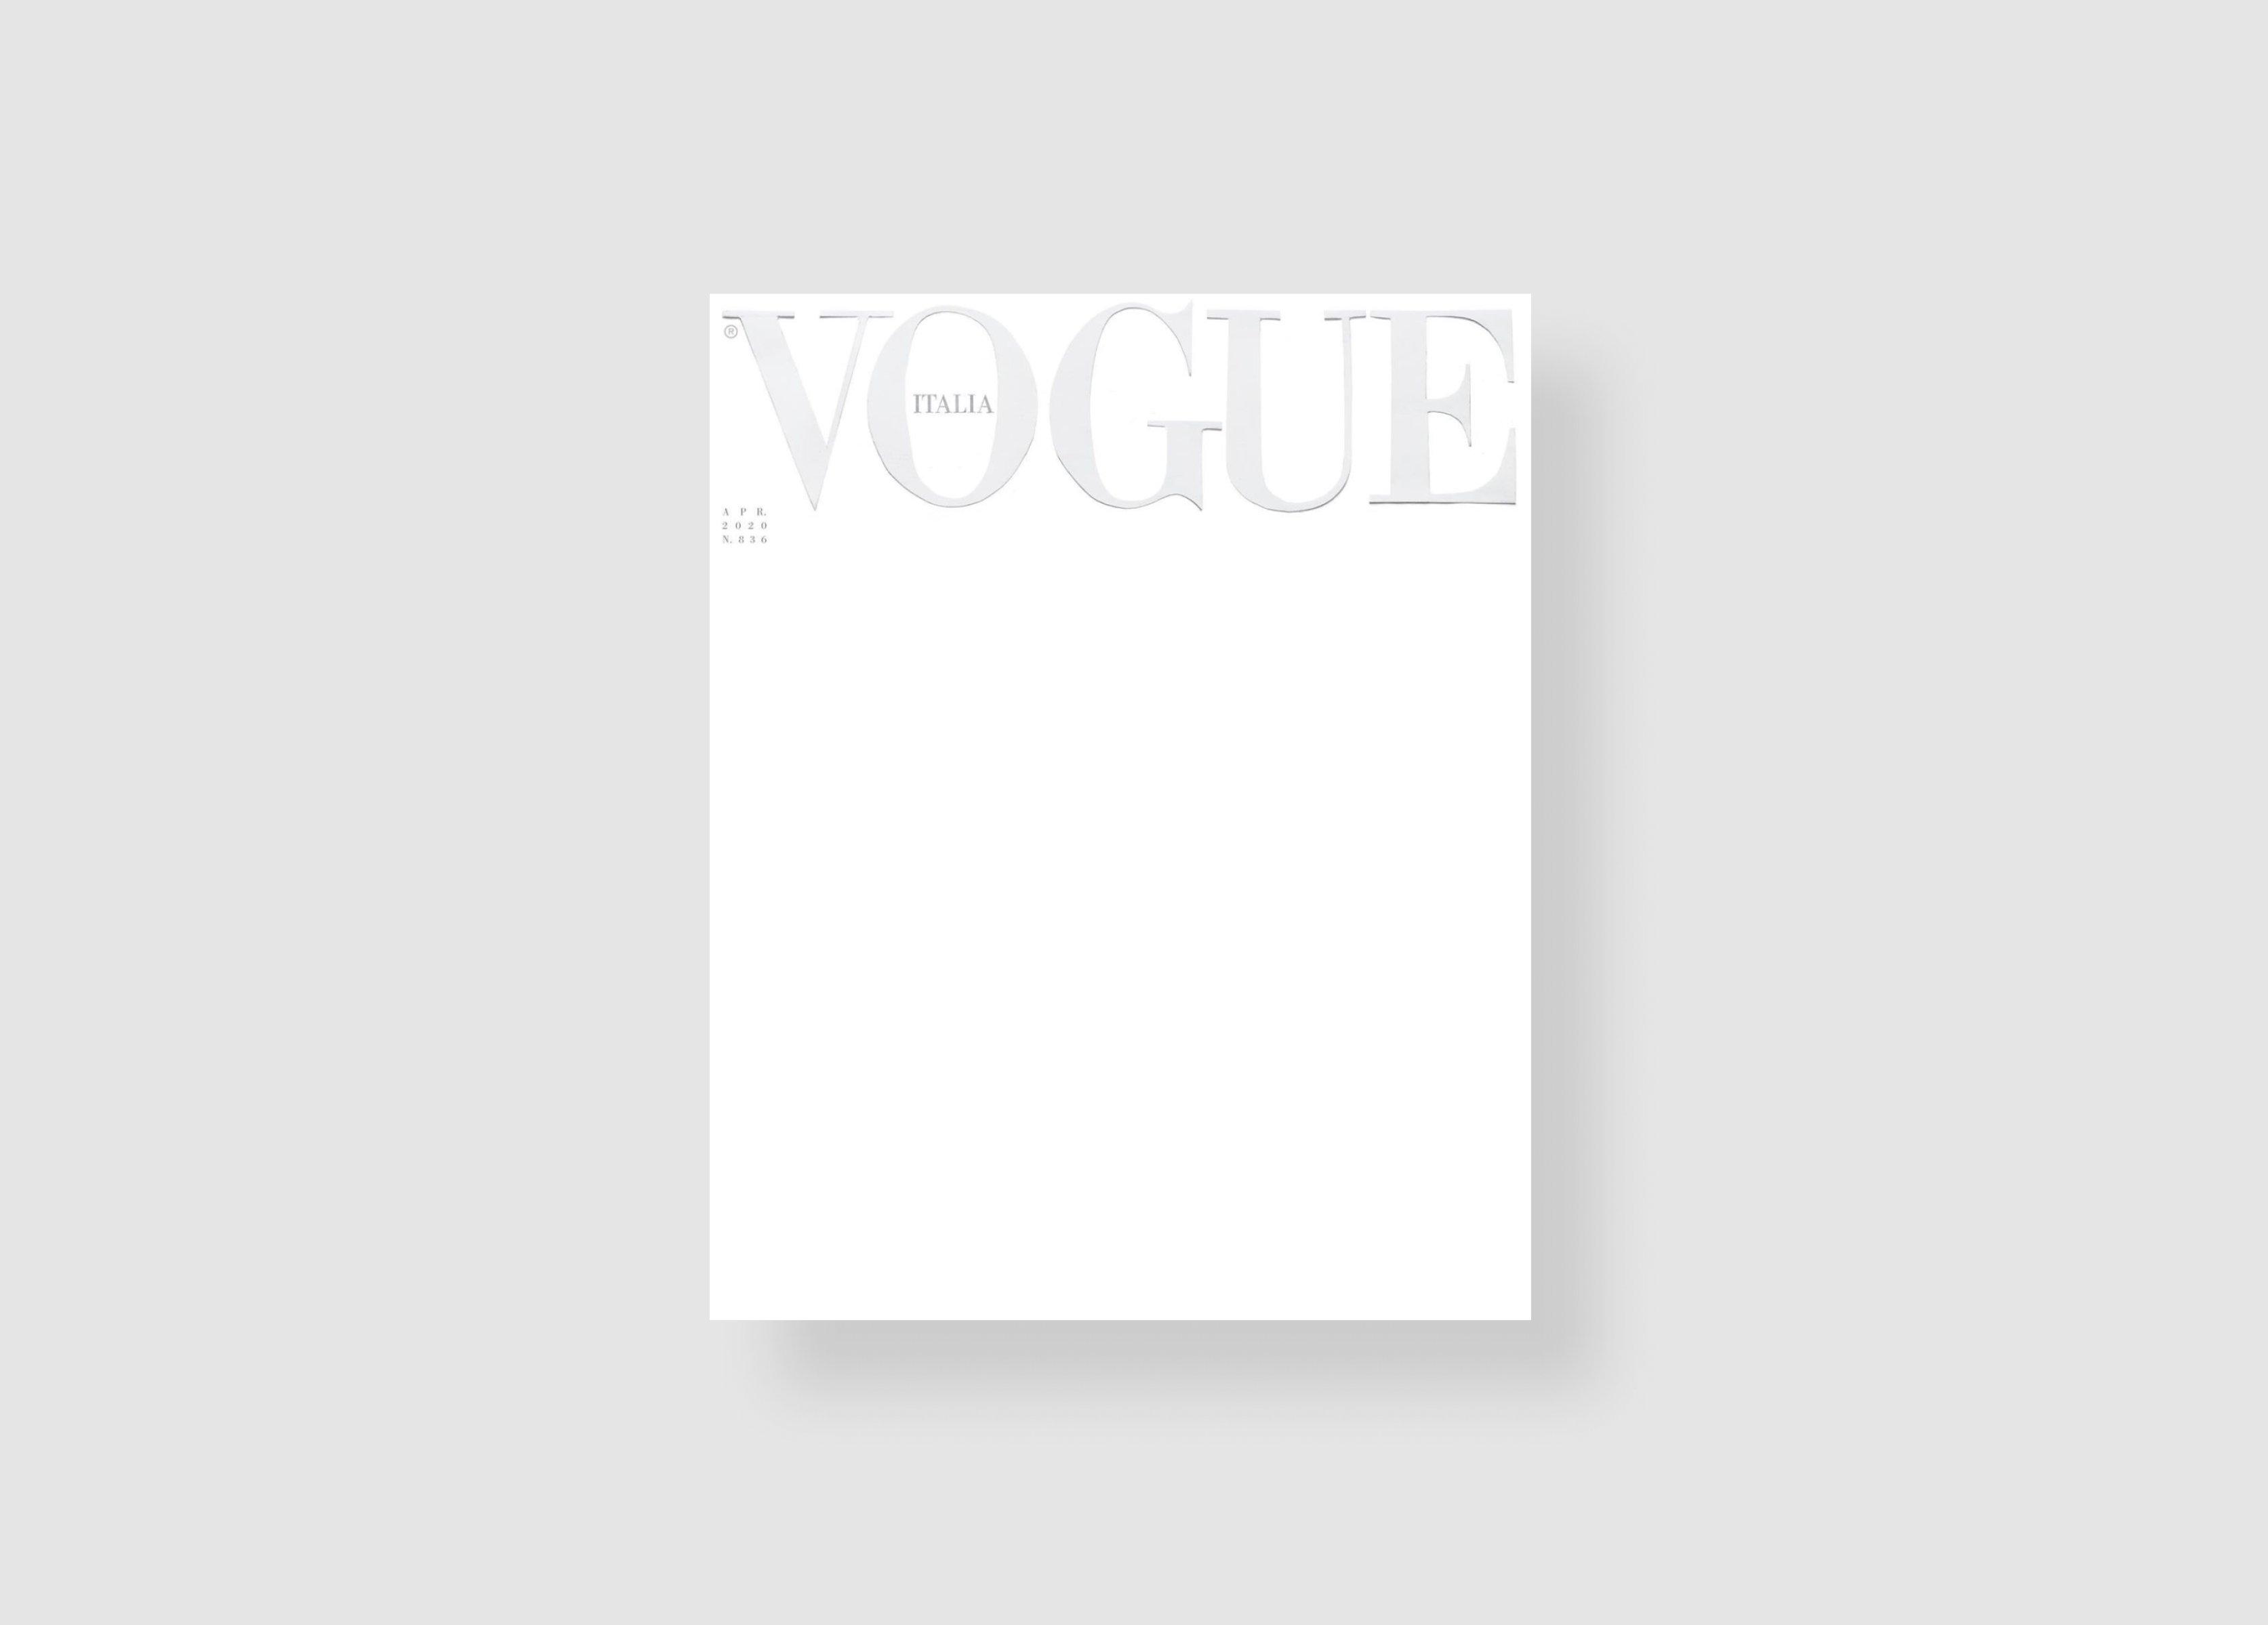 La portada de la revista Vogue en Italia 1